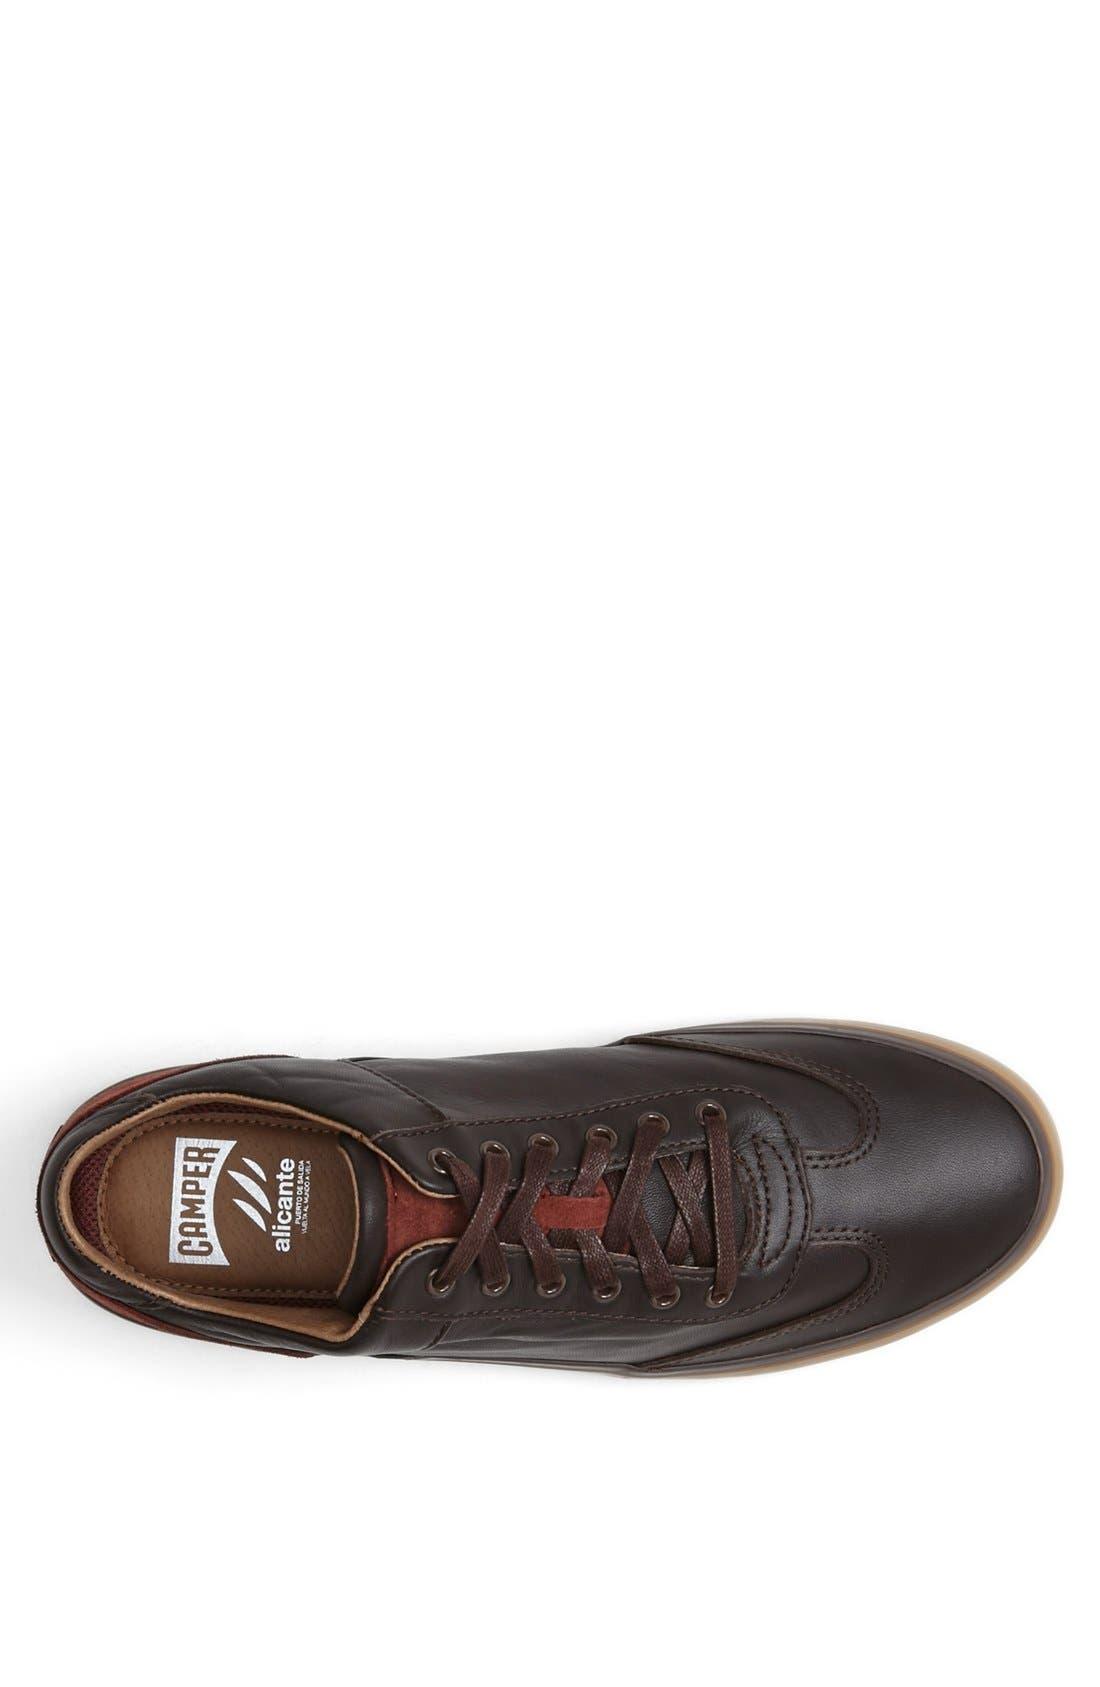 Alternate Image 3  - Camper 'Portol' Sneaker